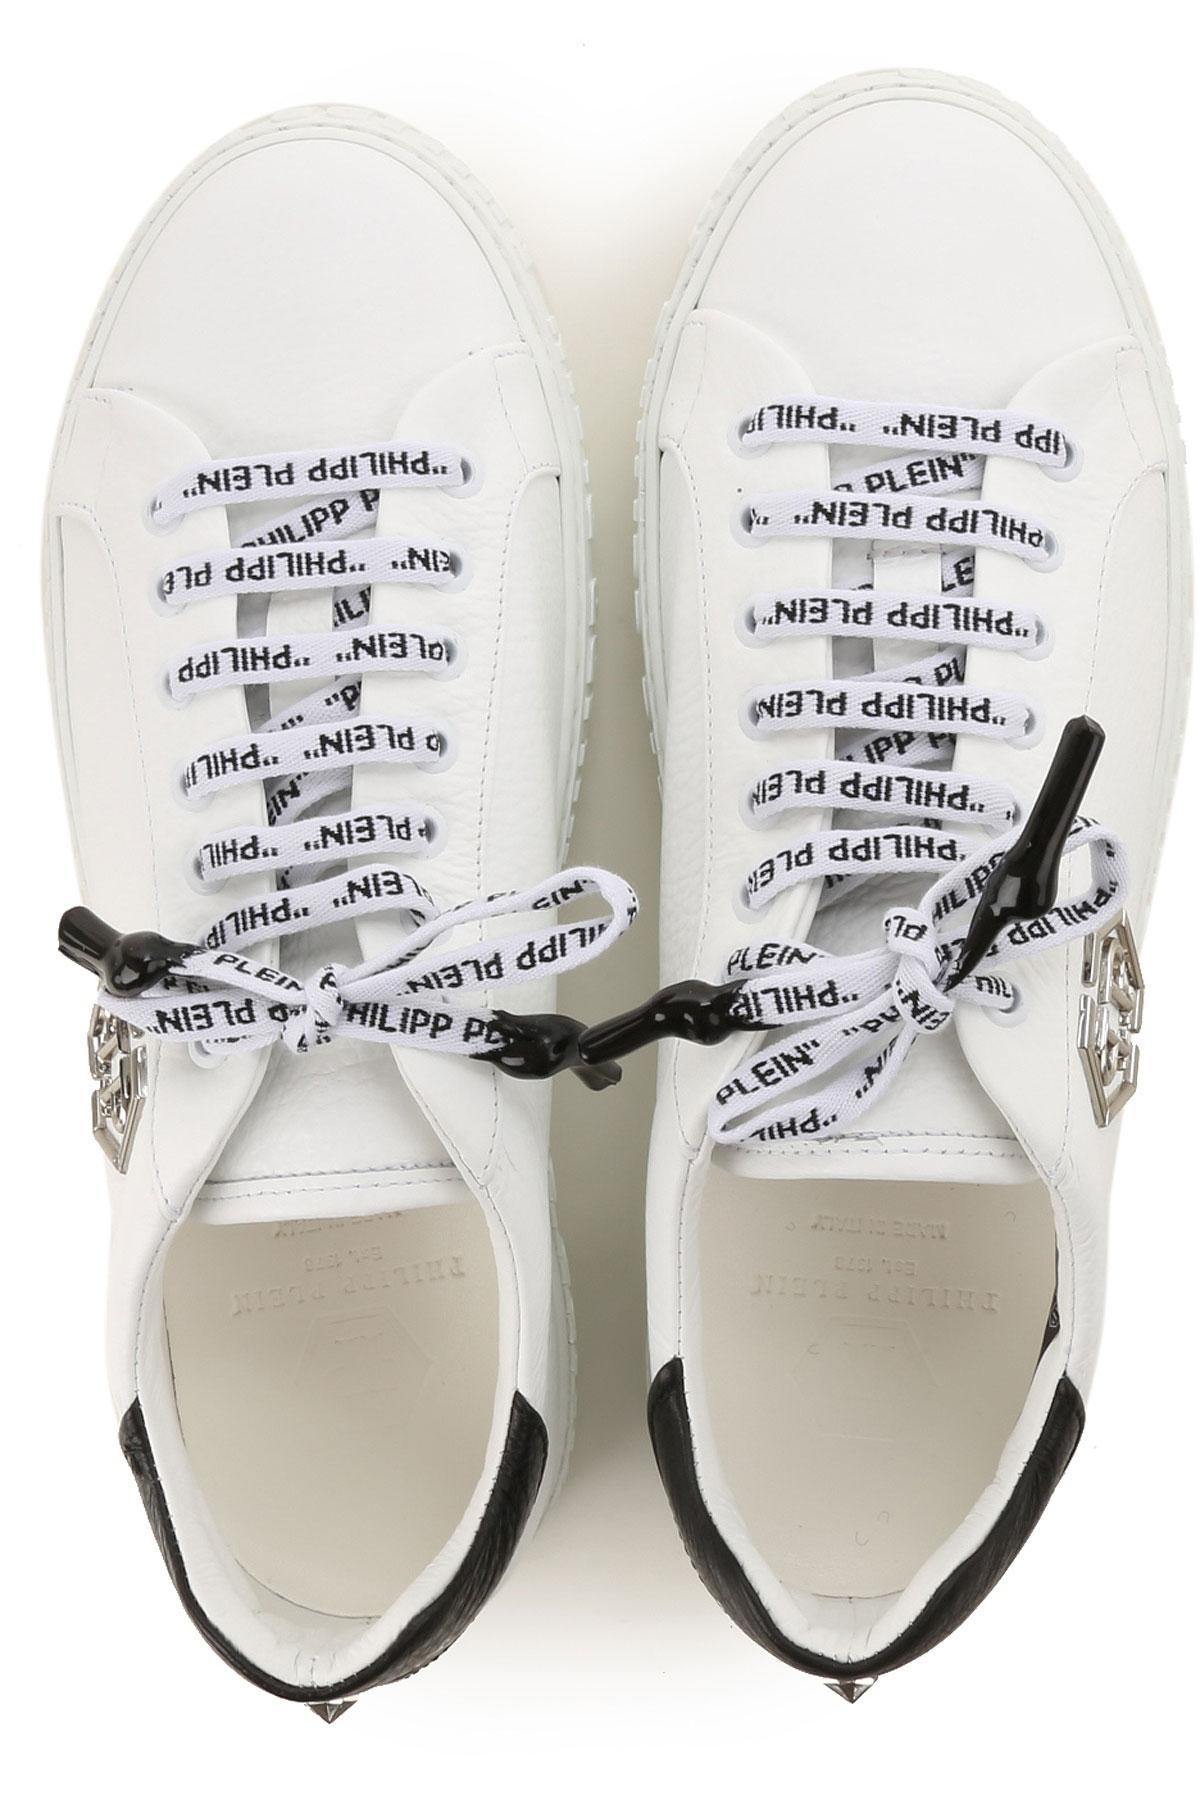 verano 2019 Plein Zapatos Para Negro Primavera Philipp Blanco Hombres waHXqWxqCB